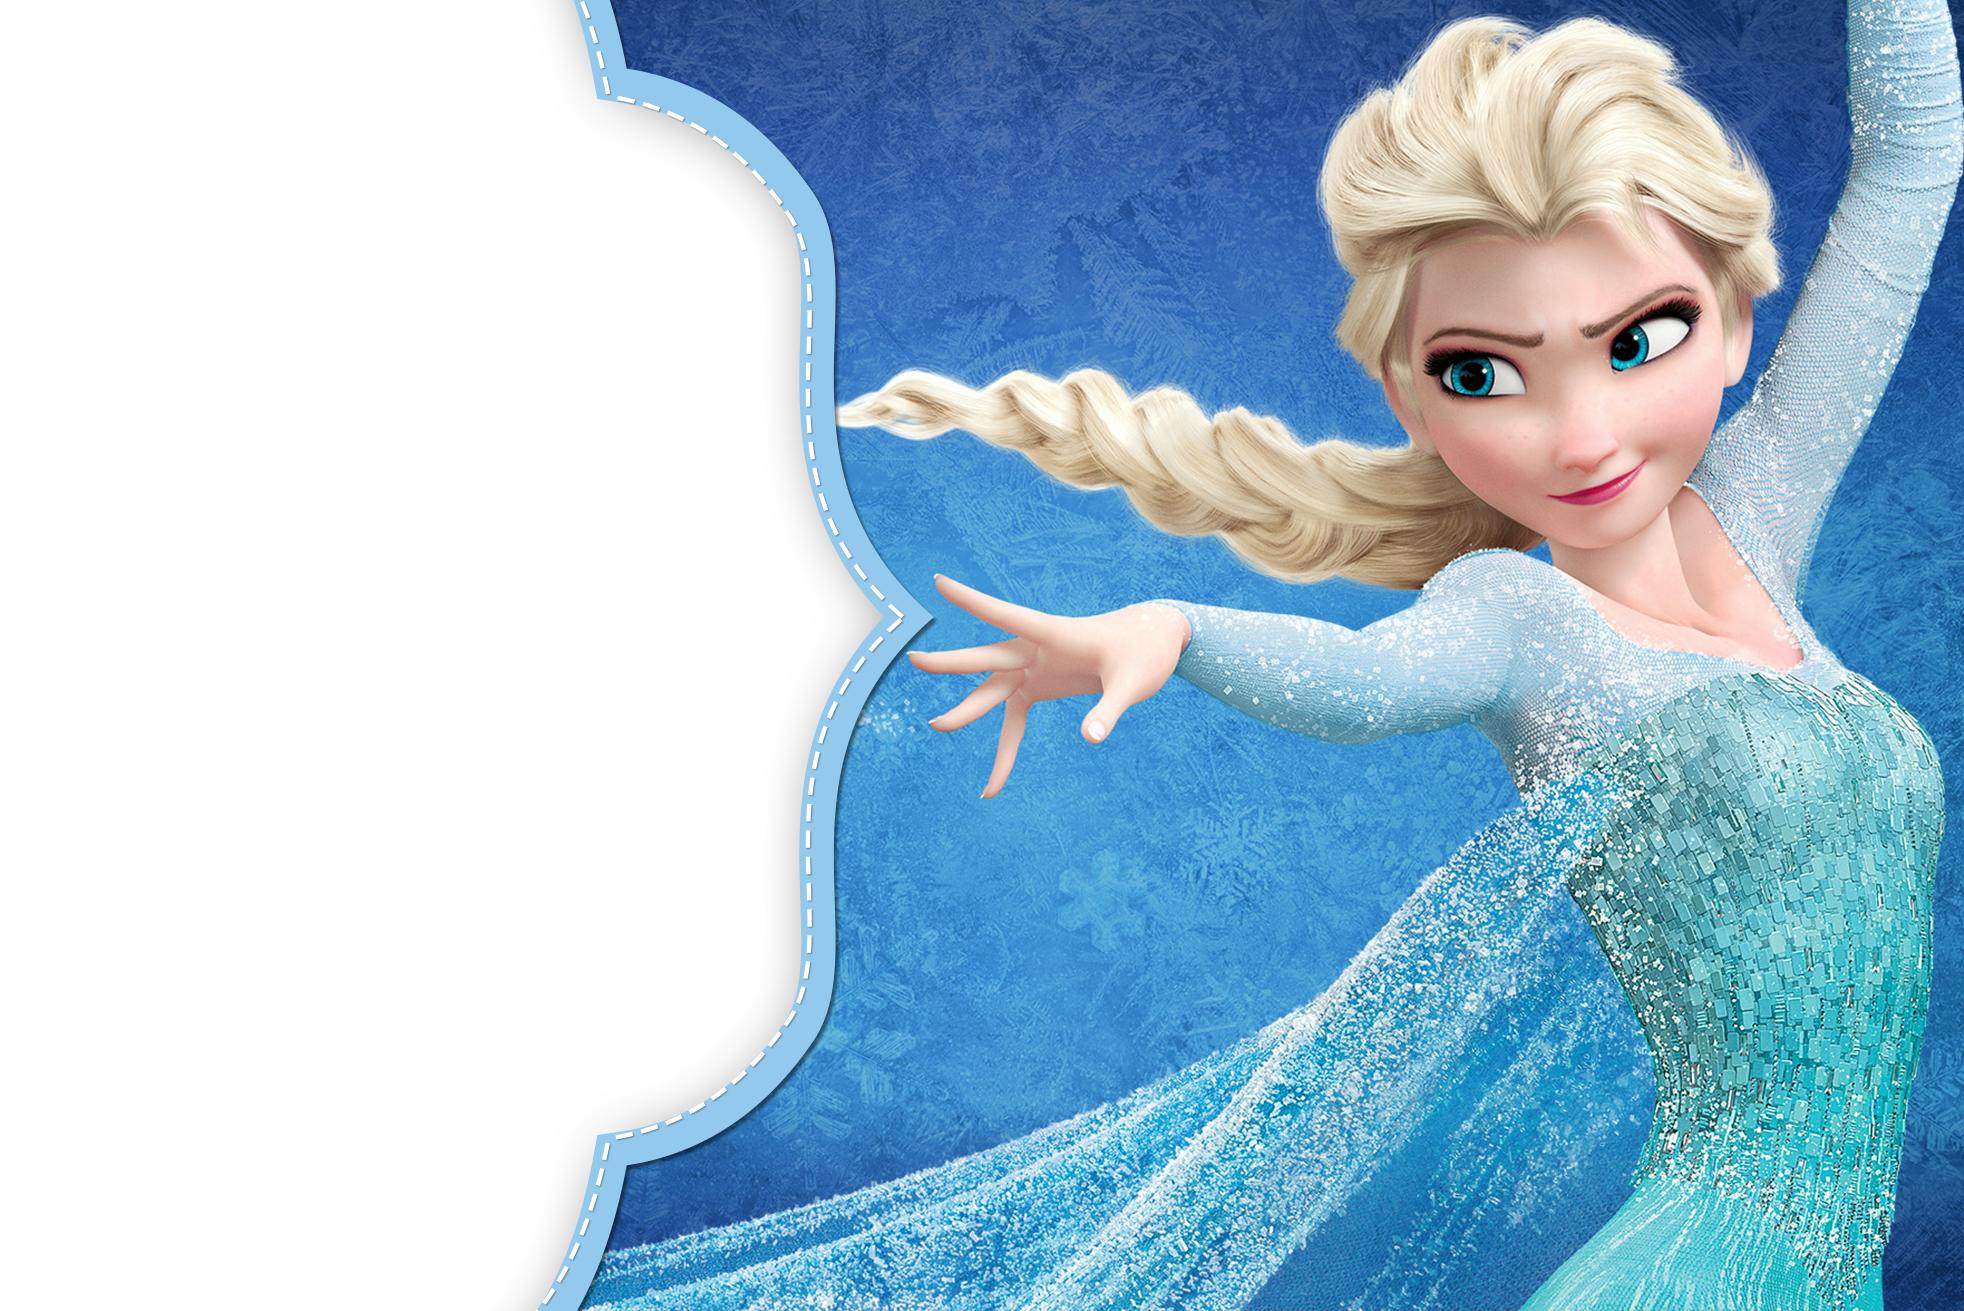 Convite Frozen 131 PNG Grátis para baixar jpg,png.